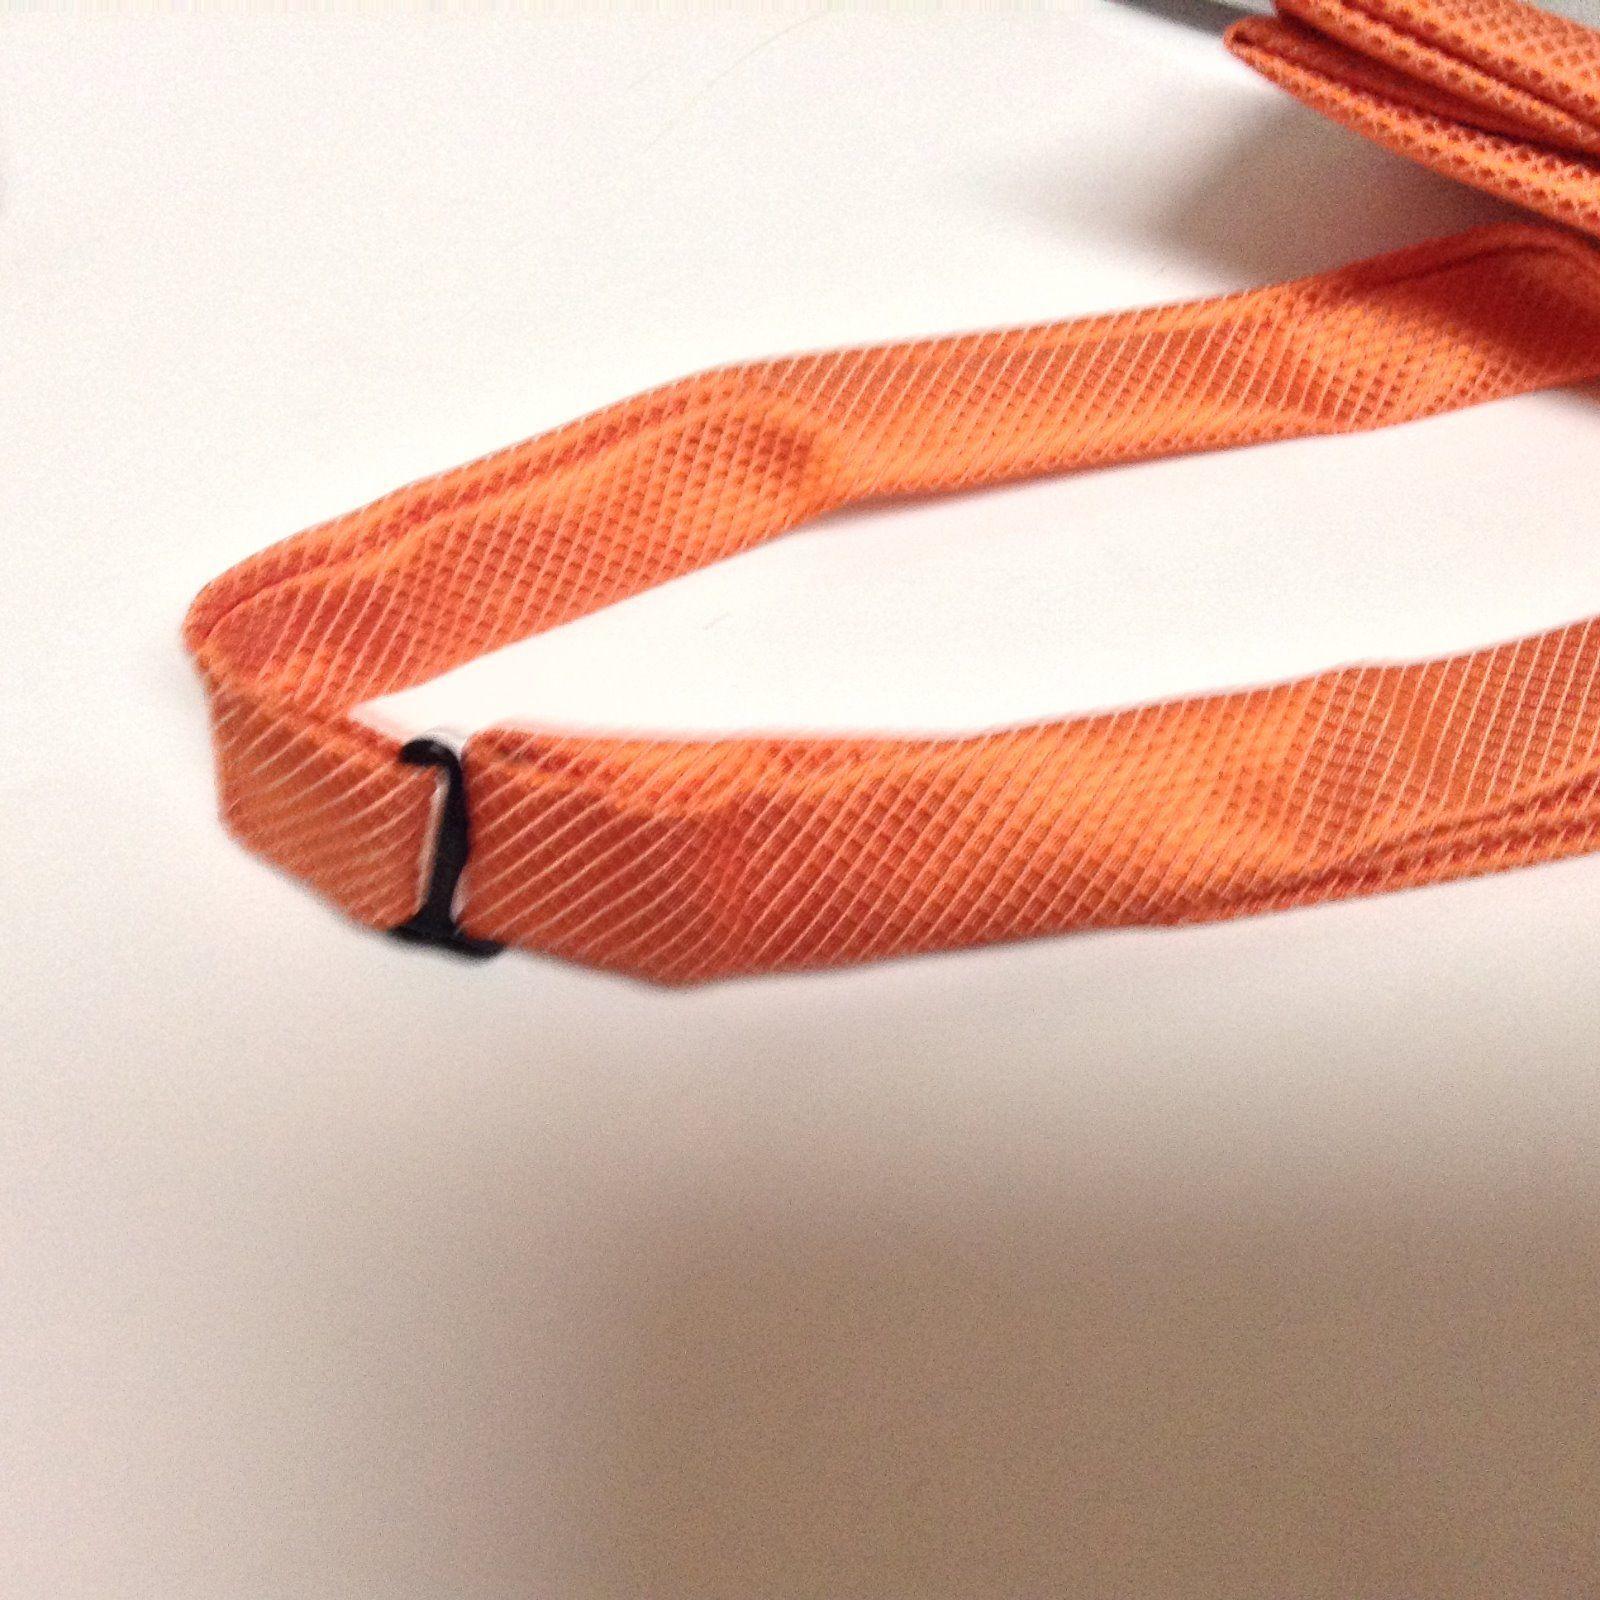 Adult Dressy Bow Tie Colorful Burnt Orange NWT Easy Adjustable